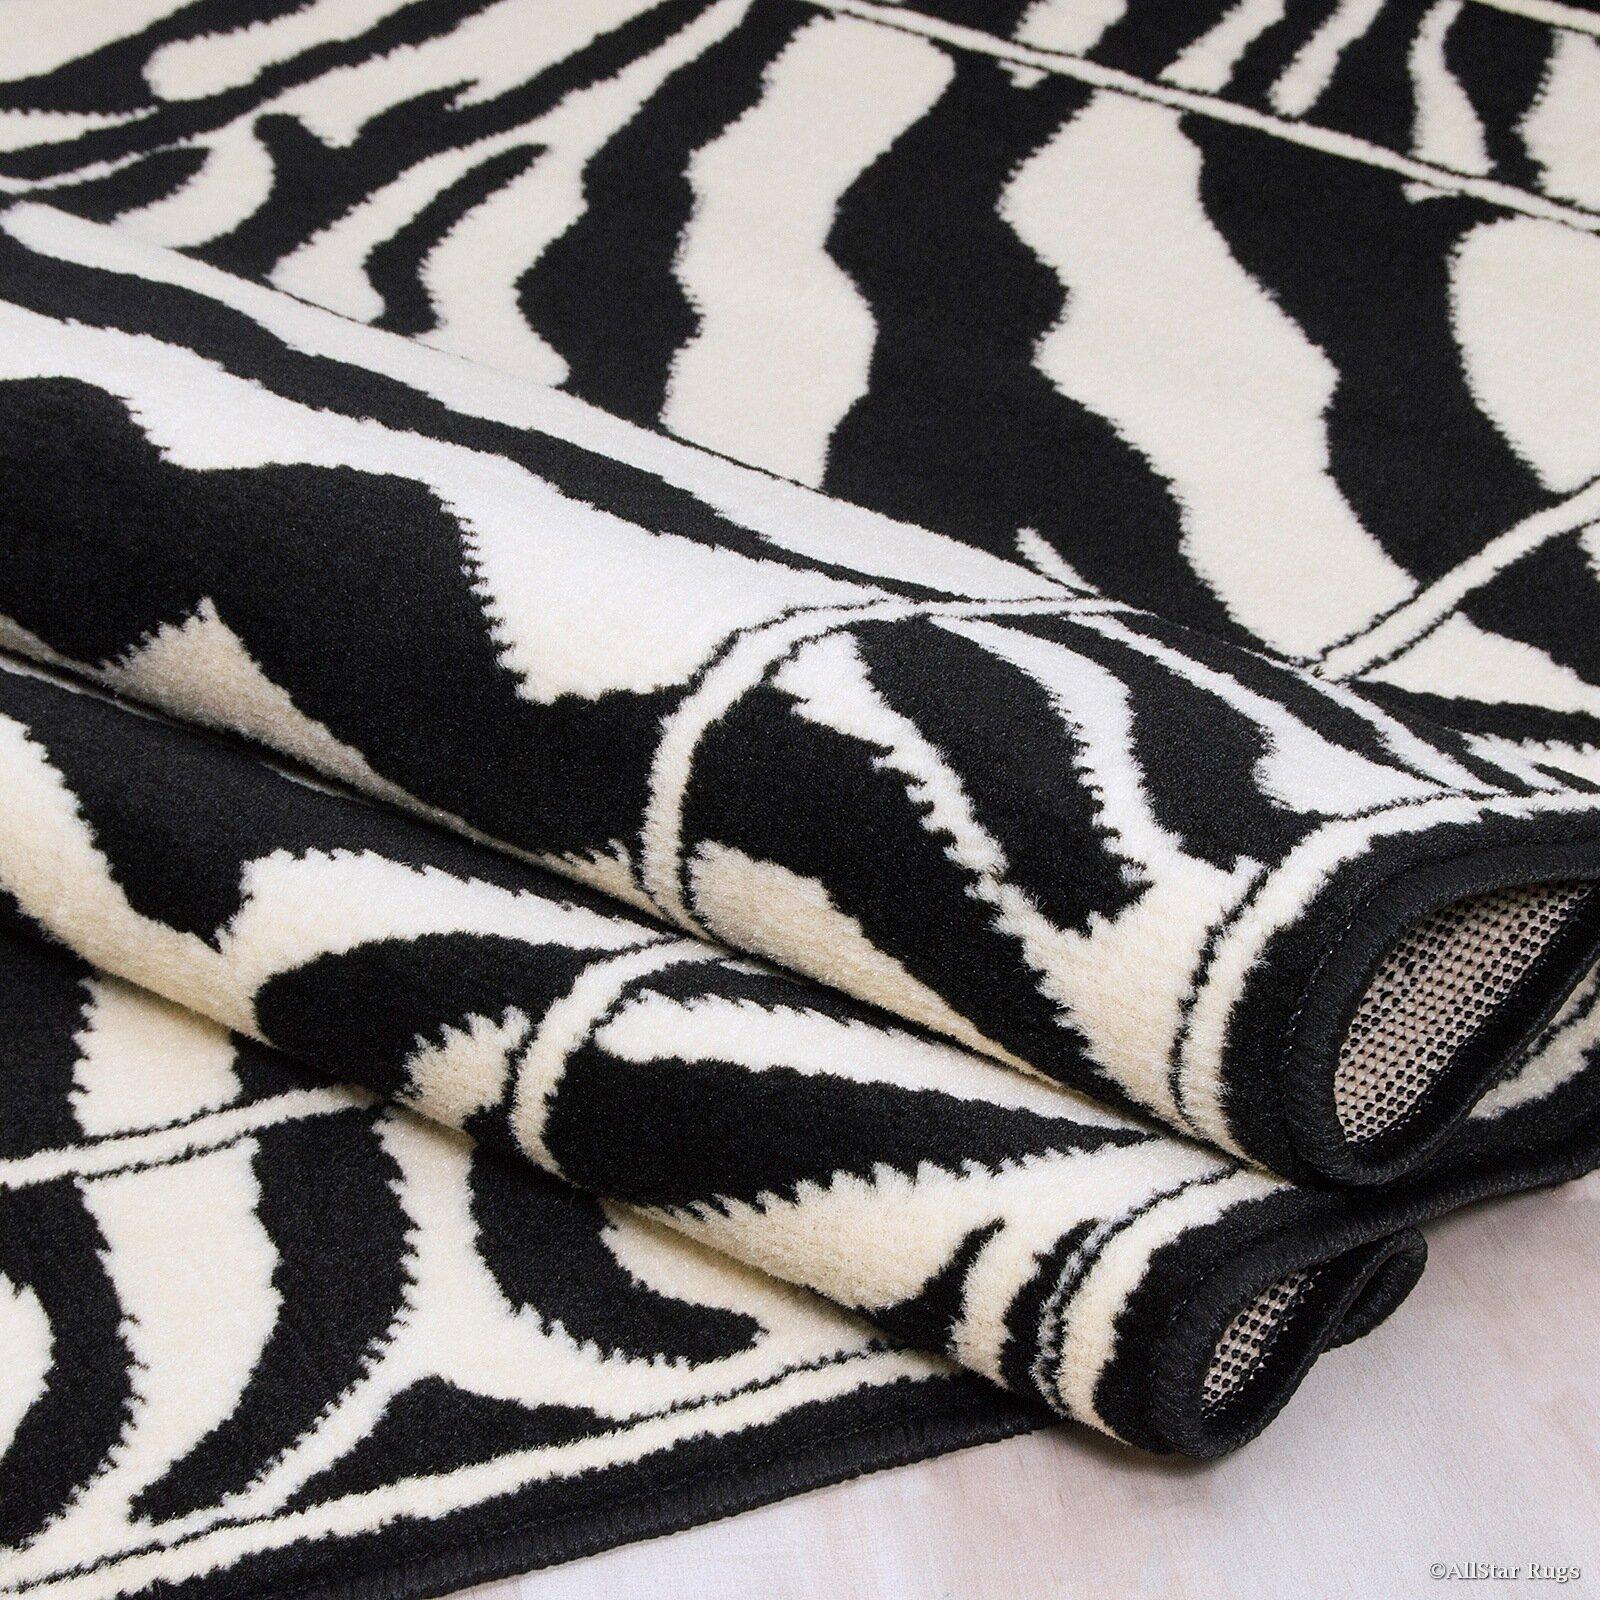 Allstar Rugs Hand Tufted White Black Area Rug Reviews